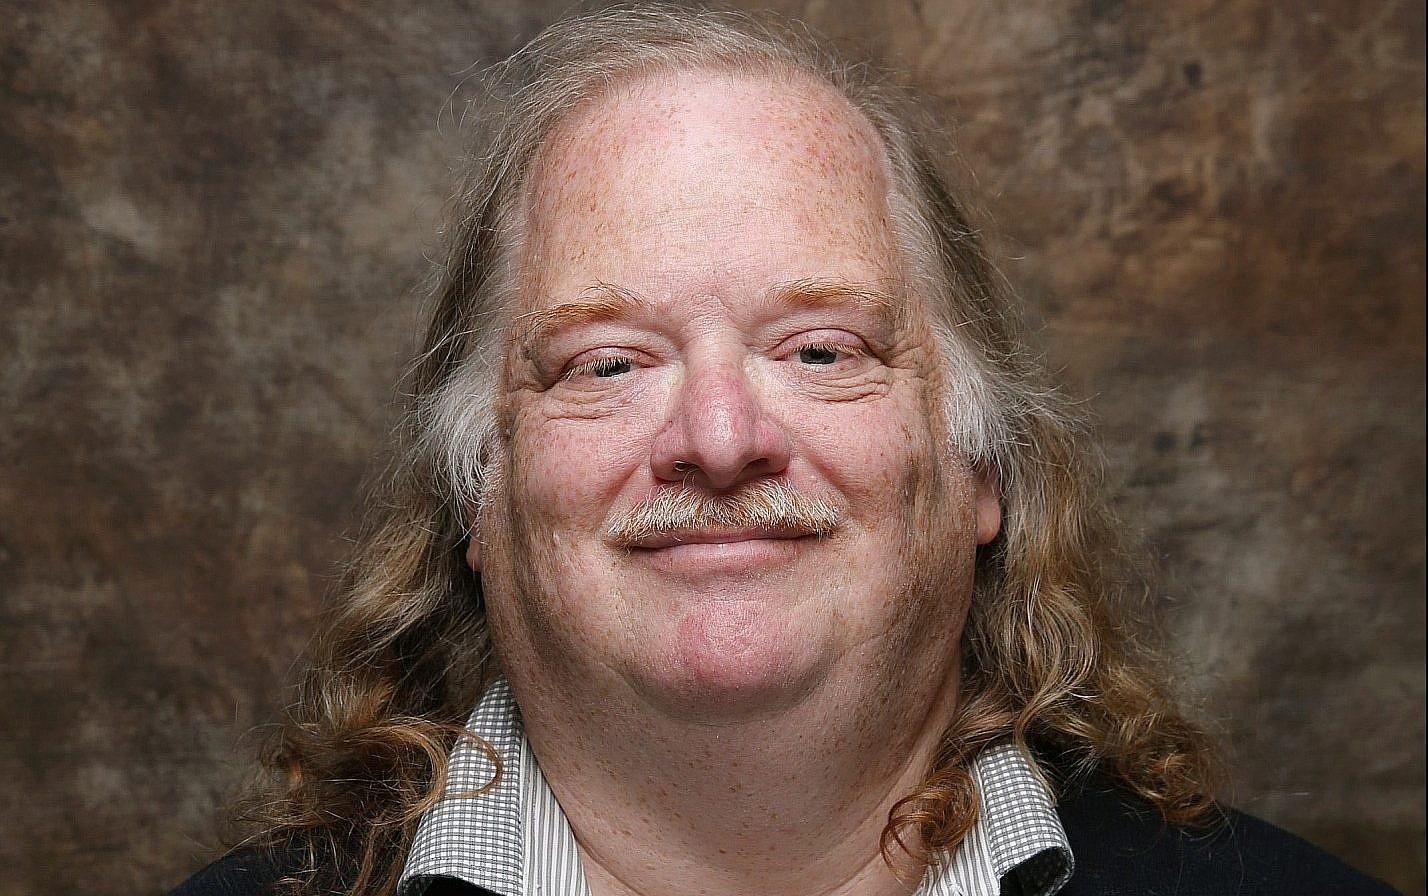 Jonathan Gold, Pulitzer Prize-winning restaurant critic, dies, LA Times says